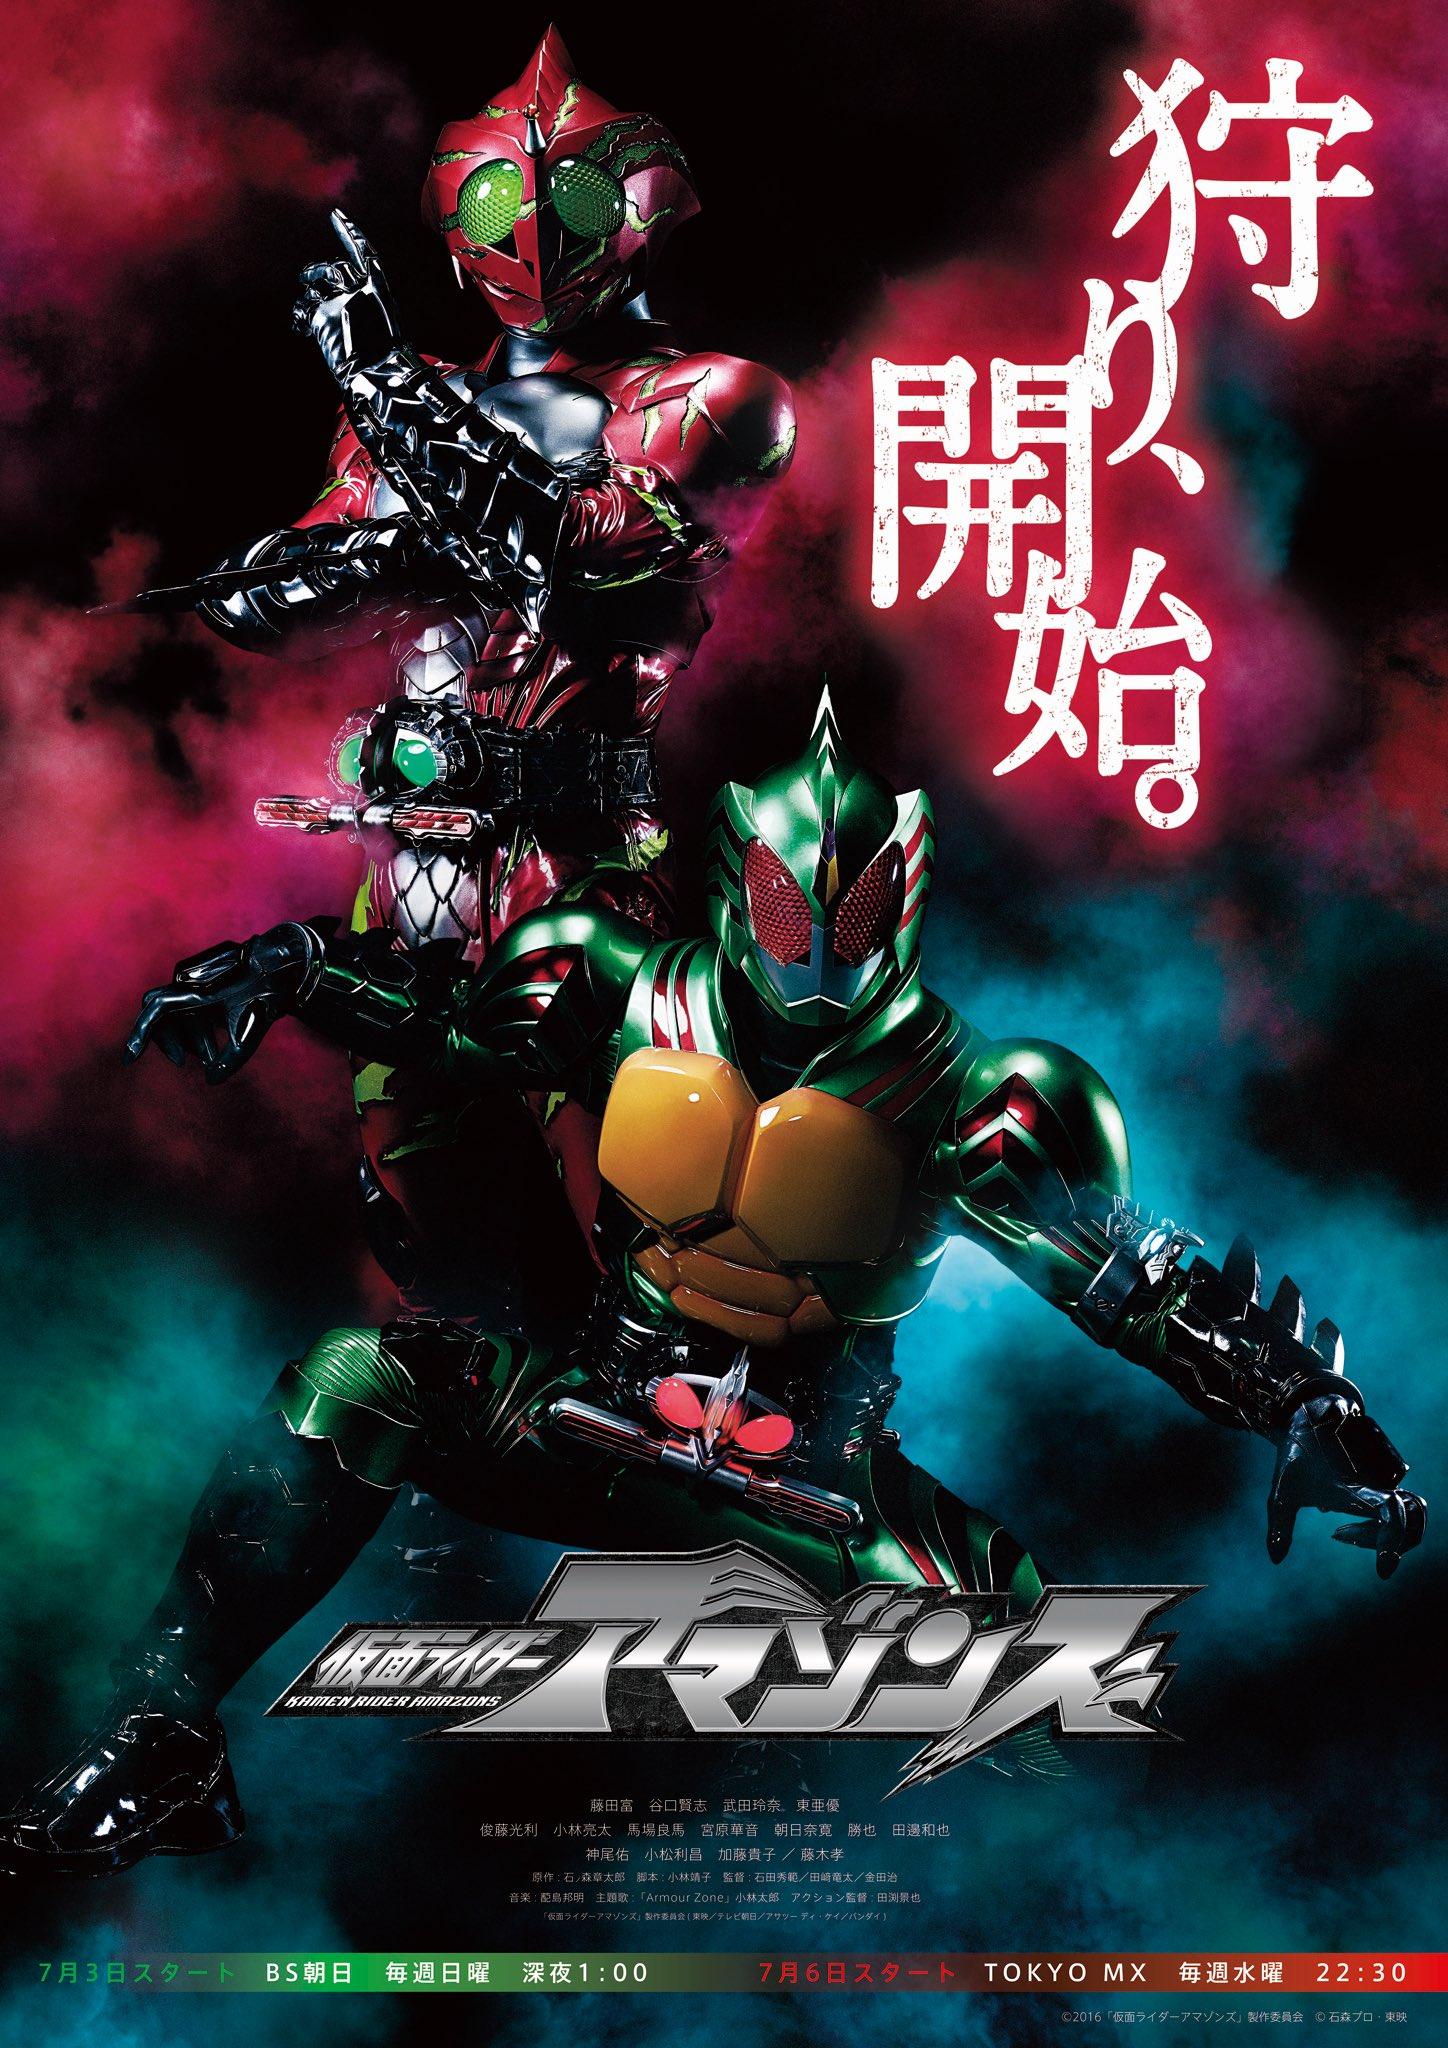 Kamen Rider Amazons | Kamen Rider Wiki | FANDOM powered by Wikia